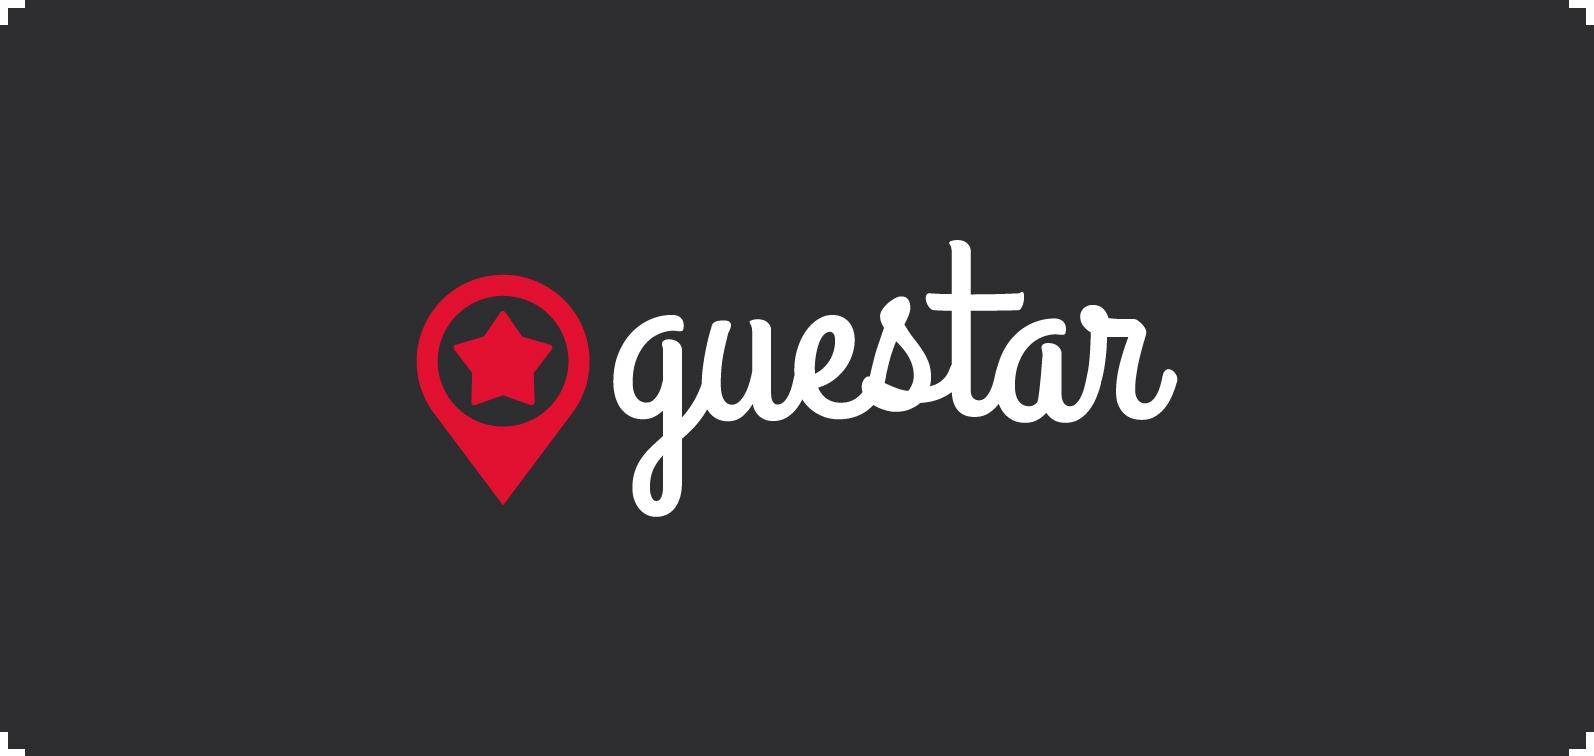 guestar_03